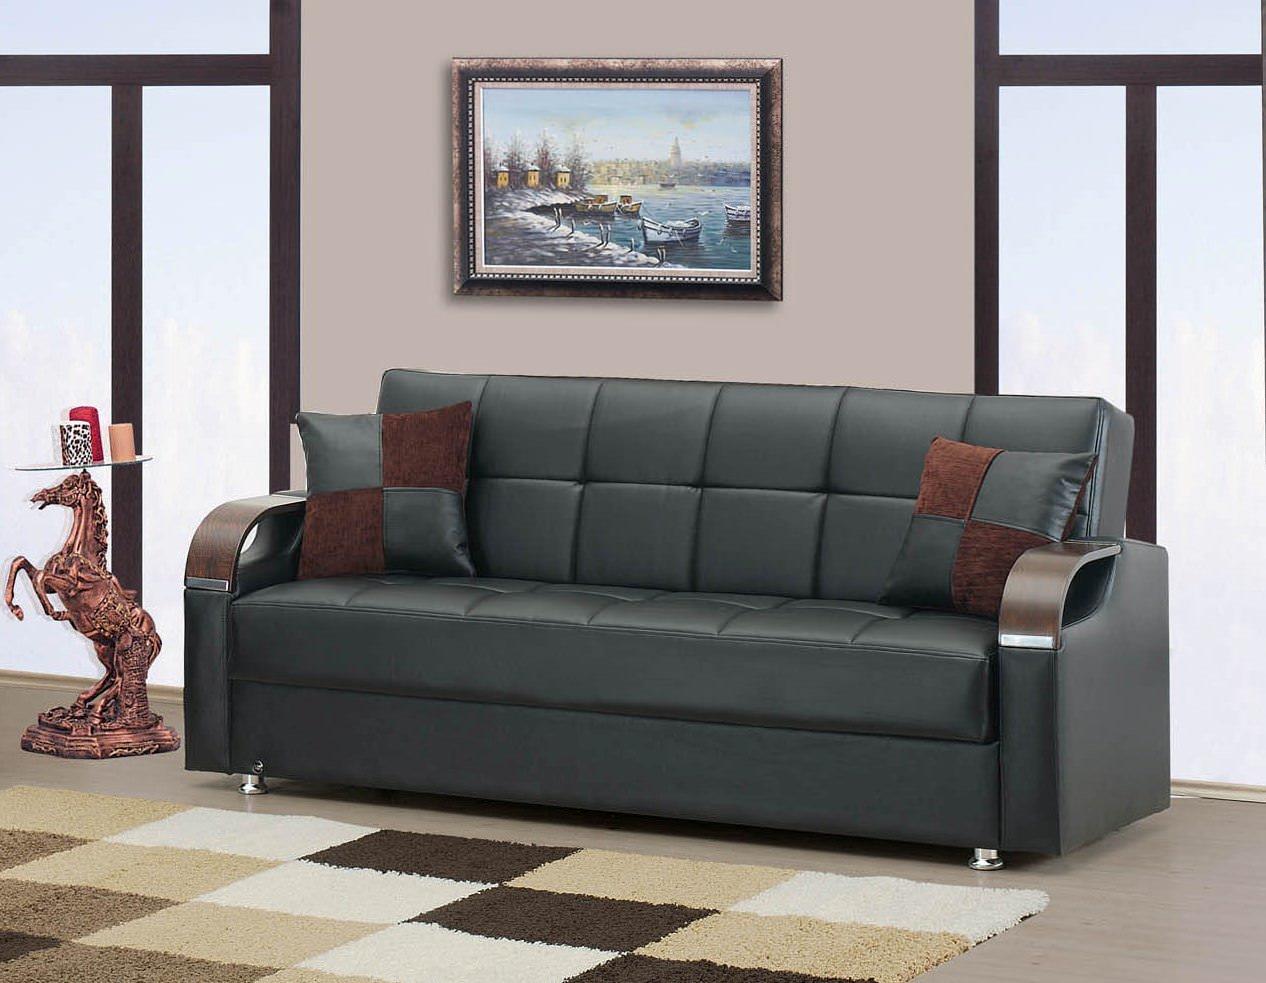 Angel espresso black bonded sofa bed by kilim for Sofa bed name